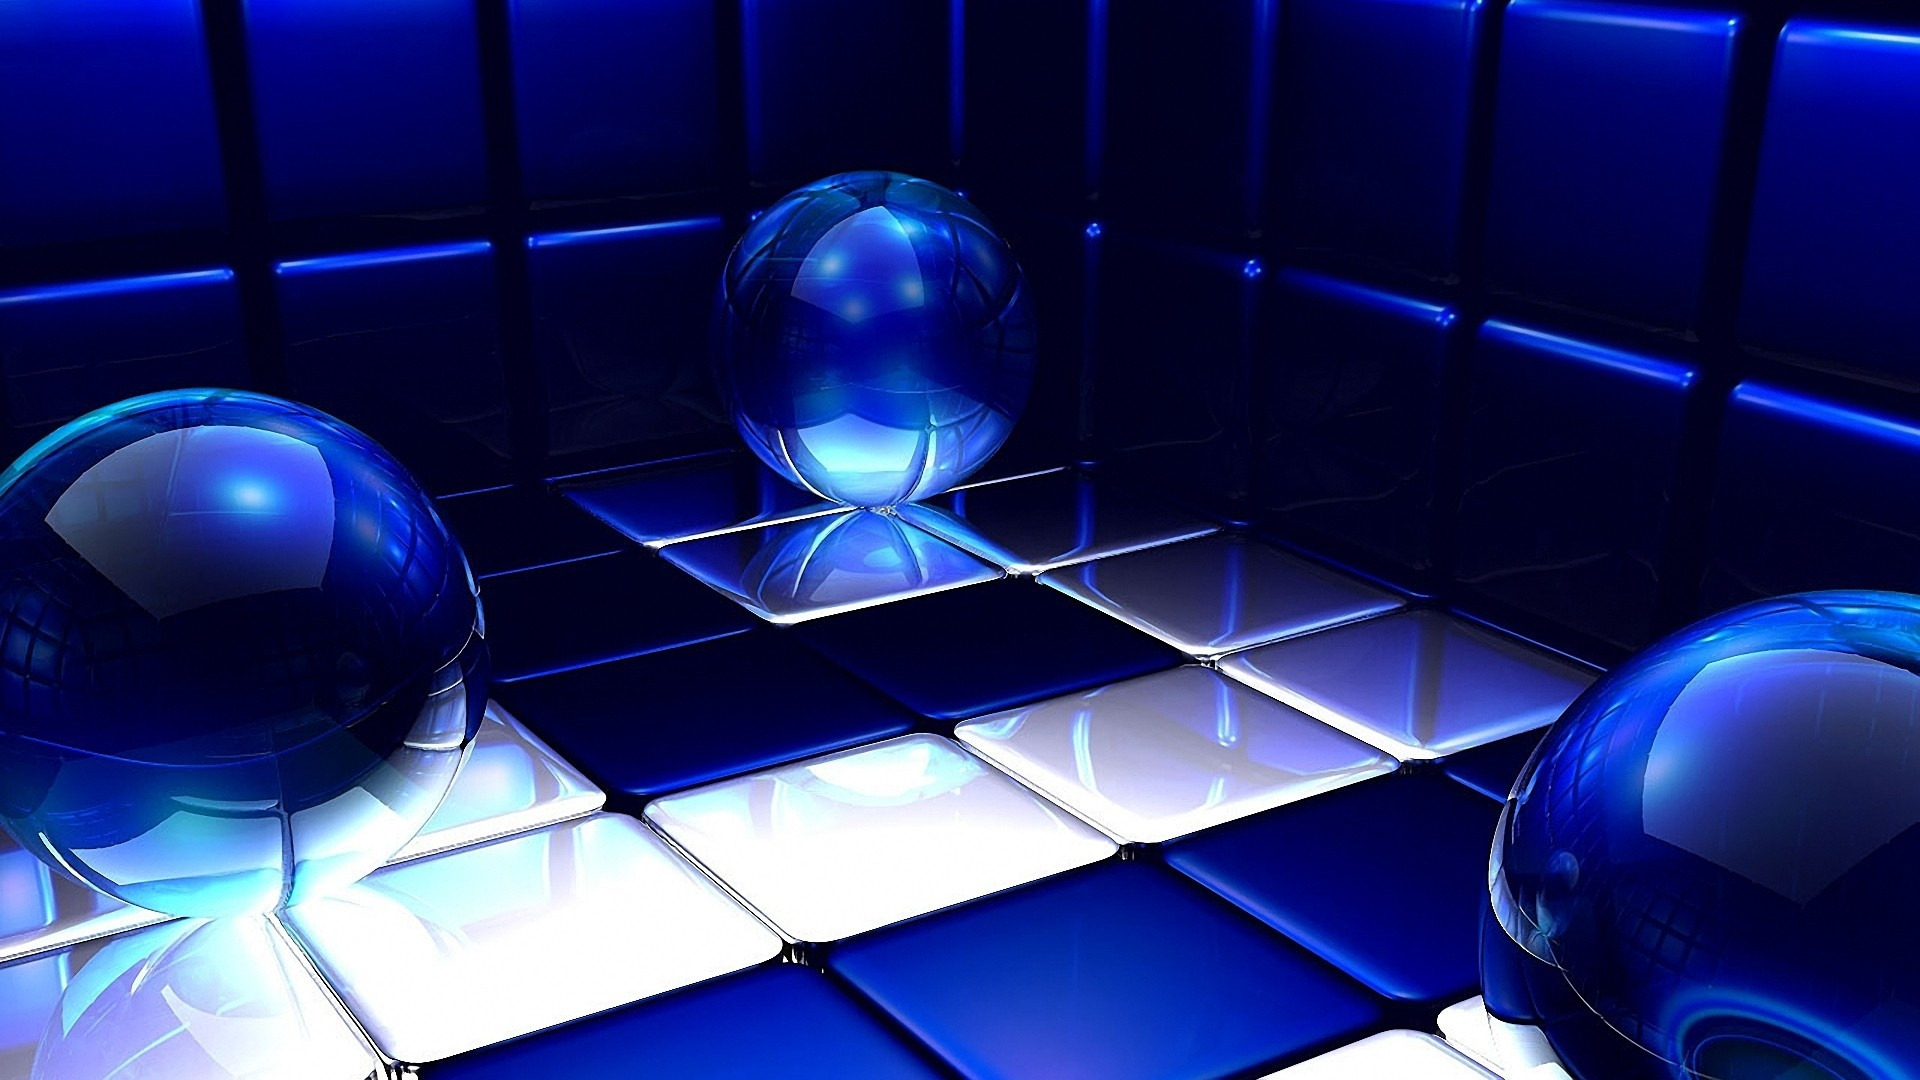 Neon Balloon wallpaper for desktop